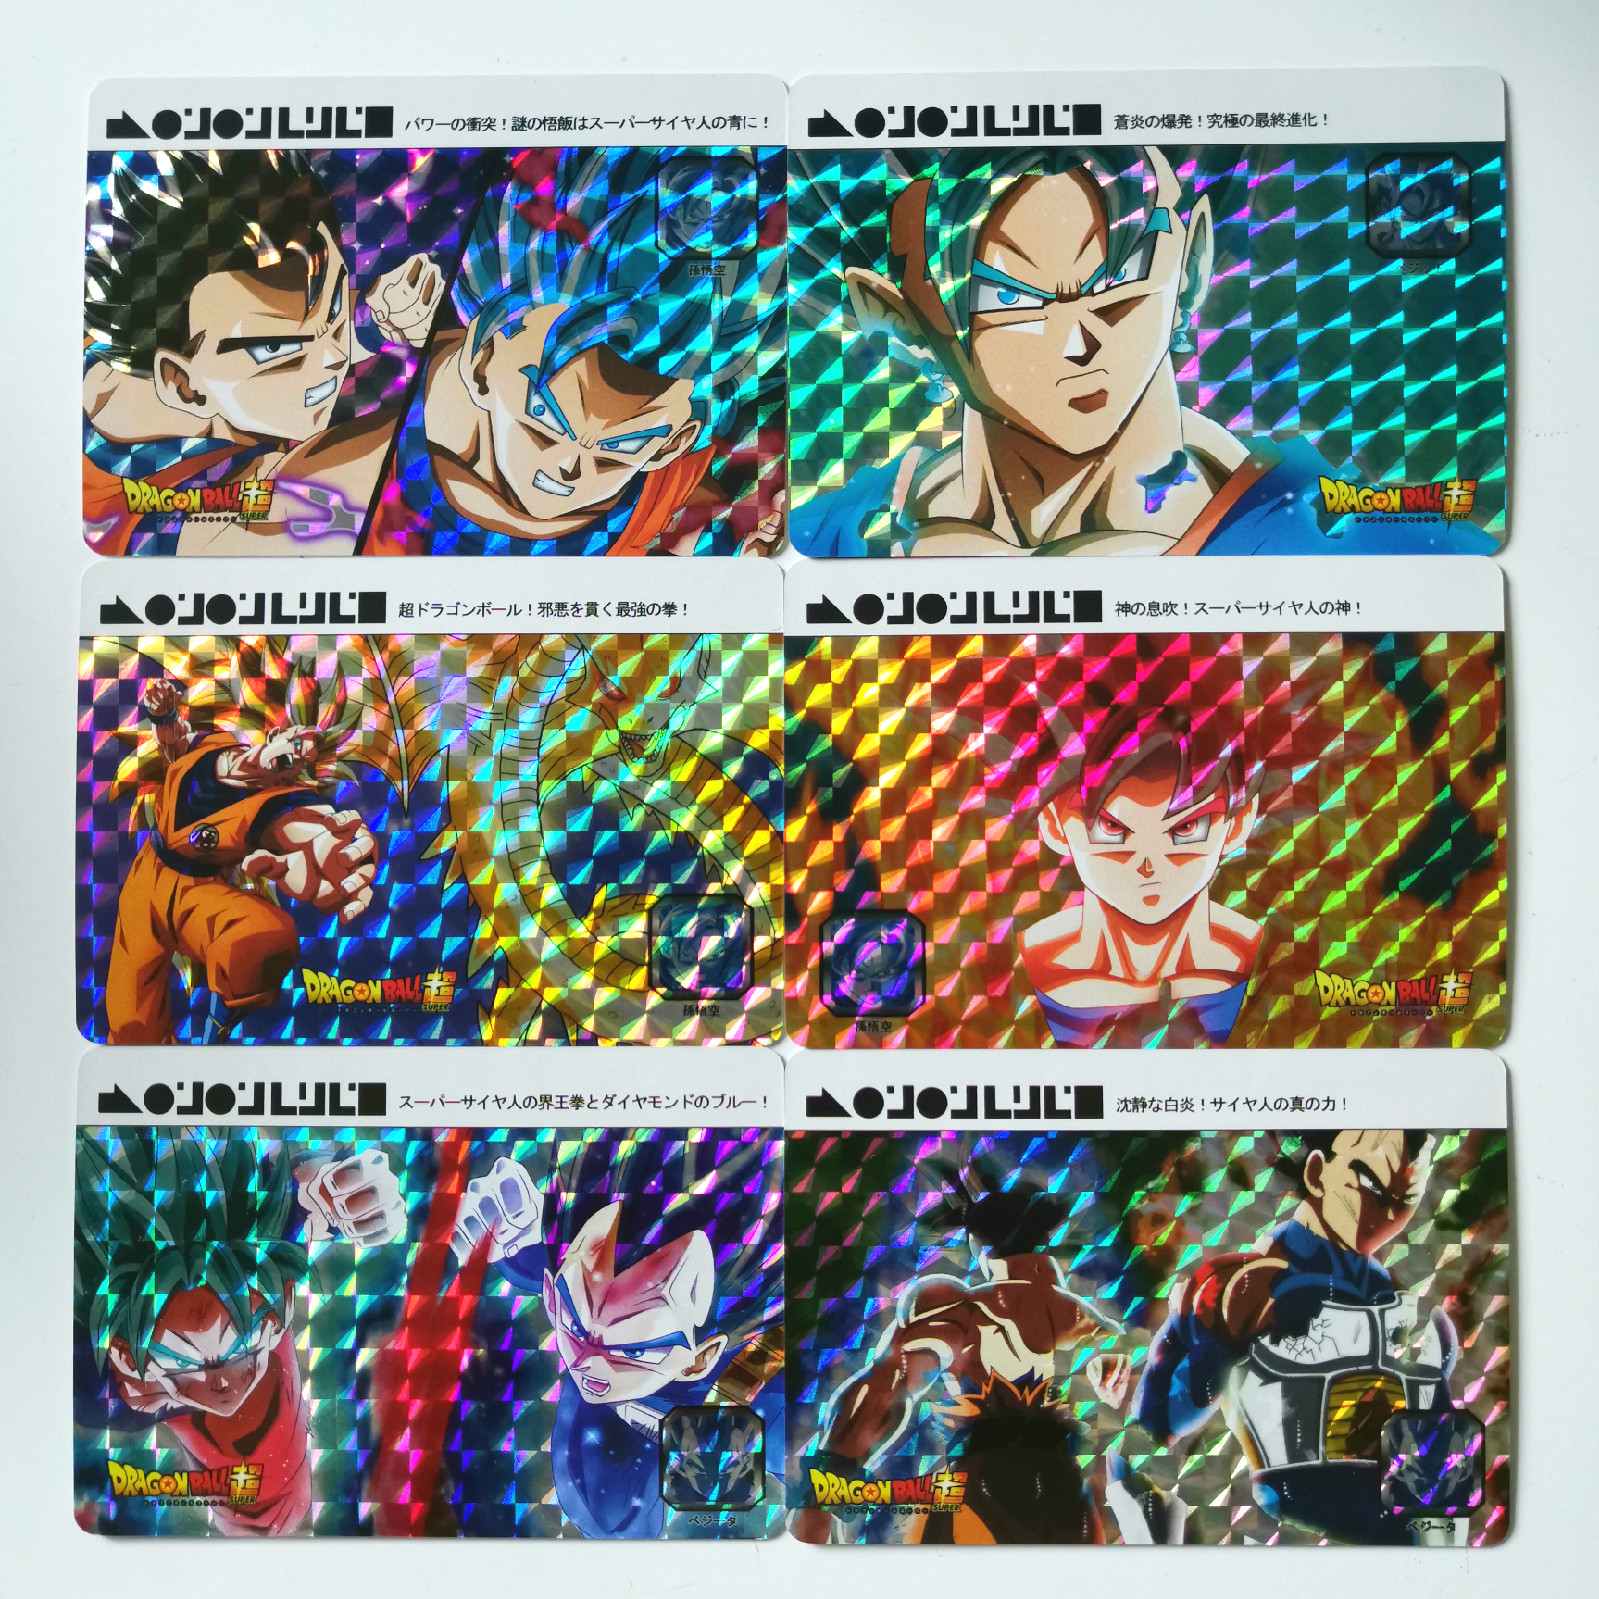 55pcs/set Super Dragon Ball Z Imitation France Style Heroes Battle Card Ultra Instinct Goku Vegeta Super Game Collection Cards